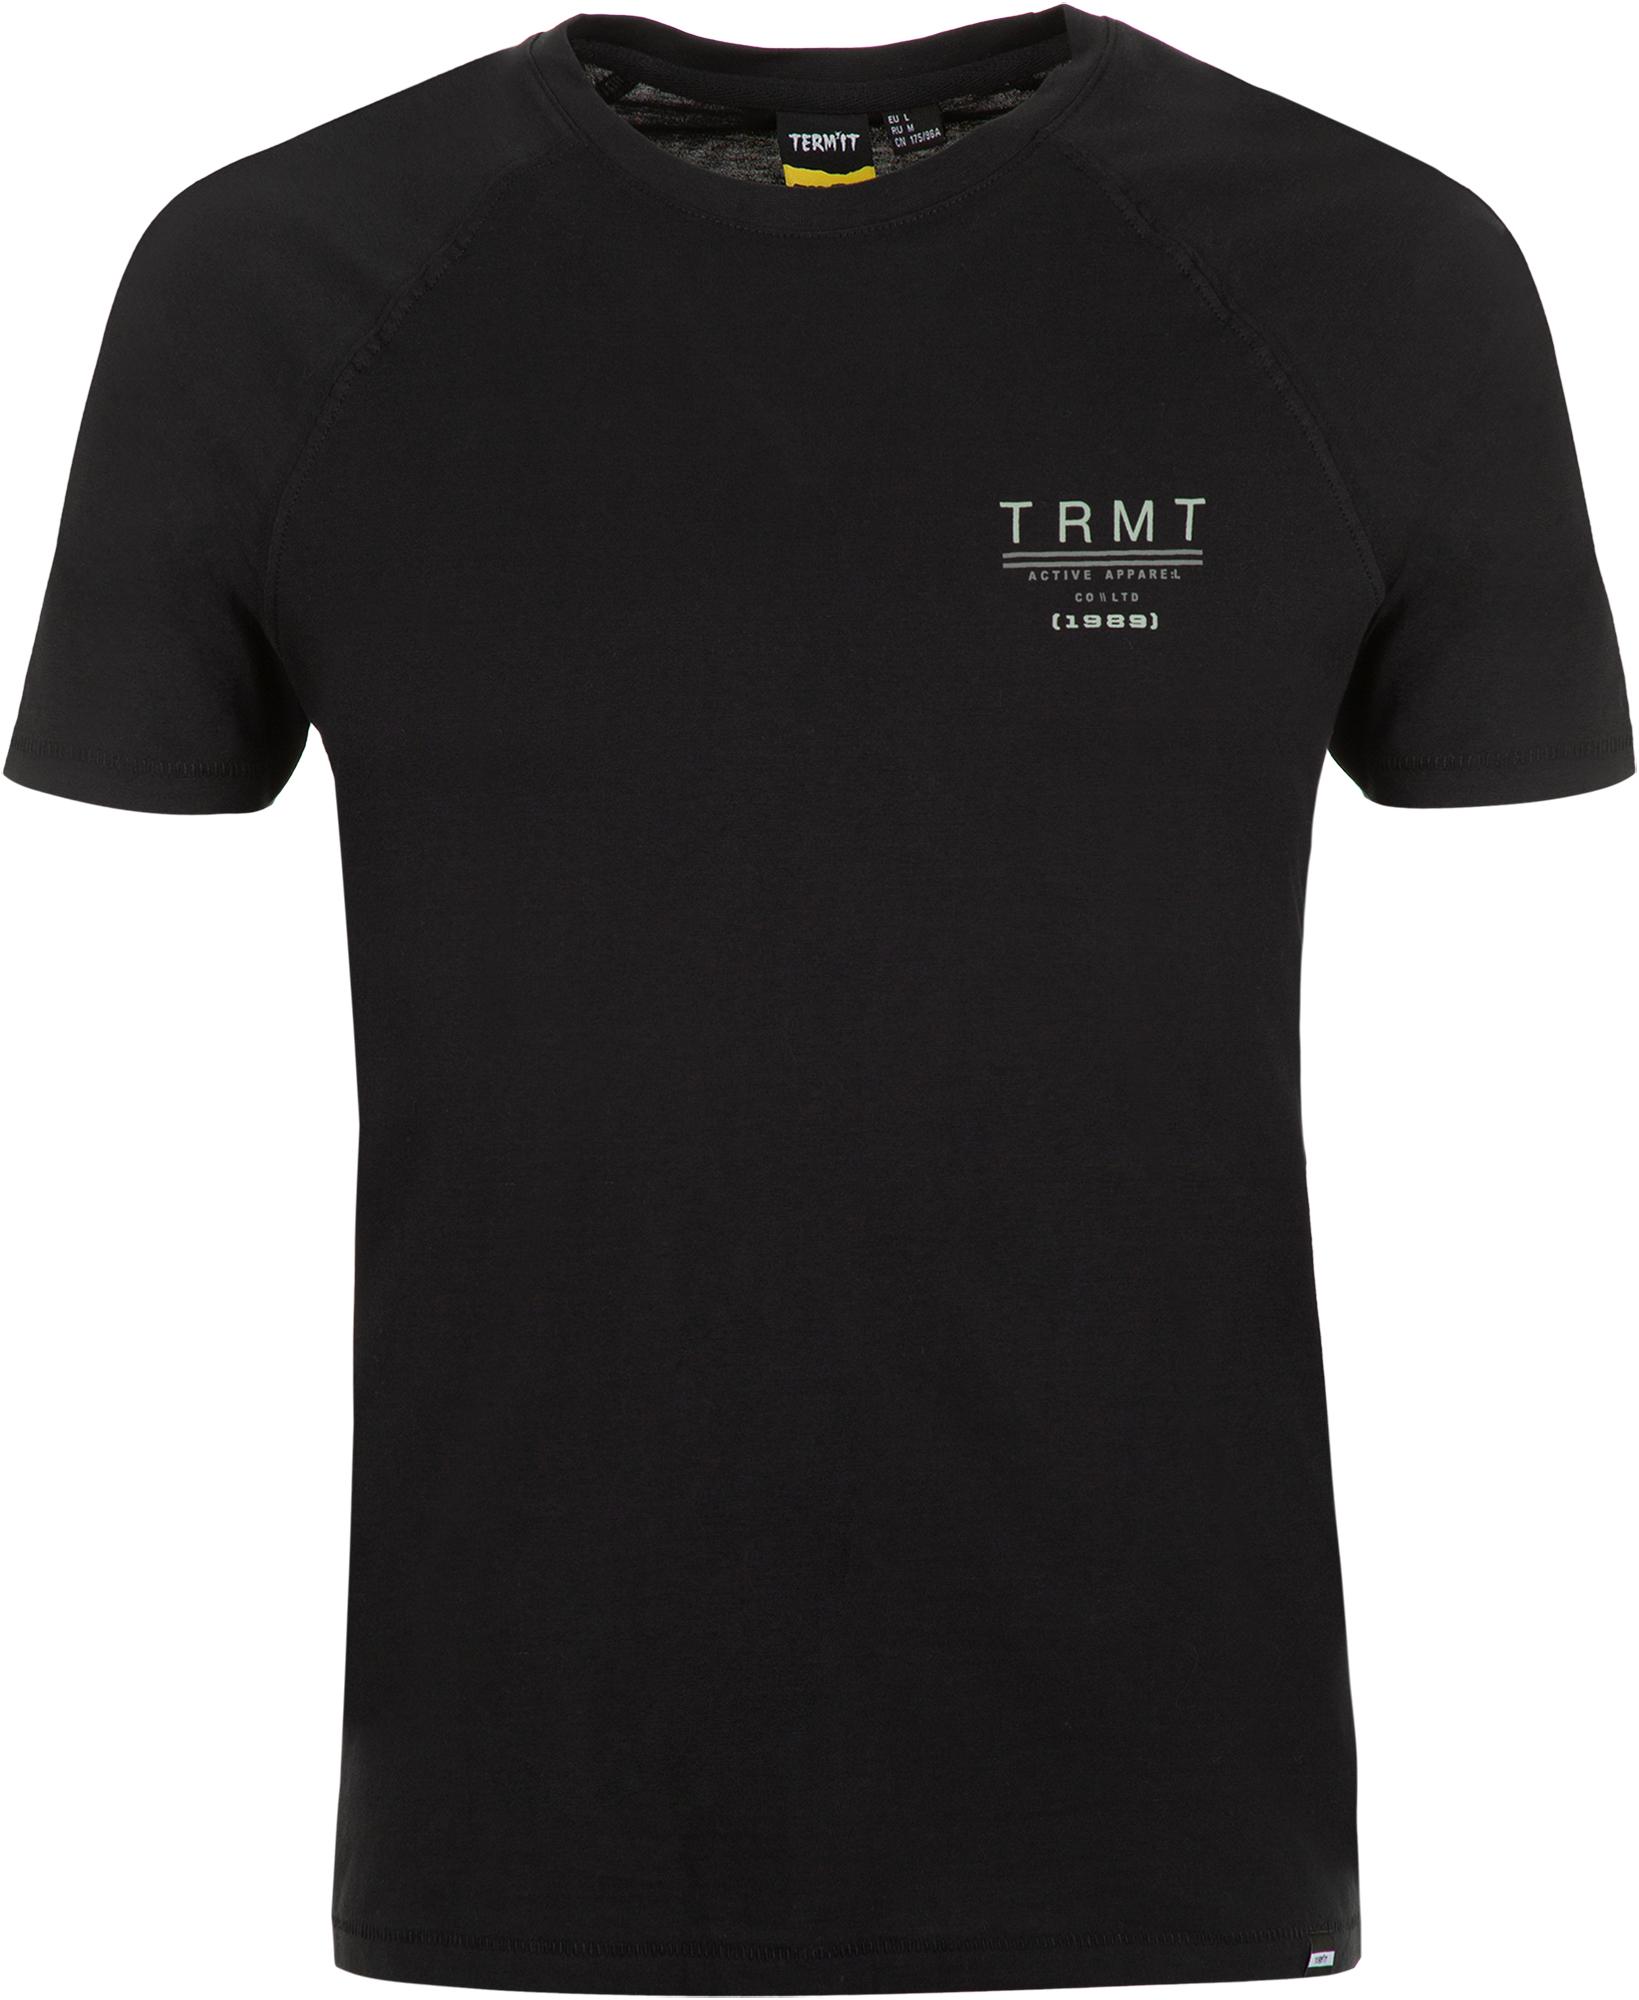 Termit Футболка мужская Termit, размер 52